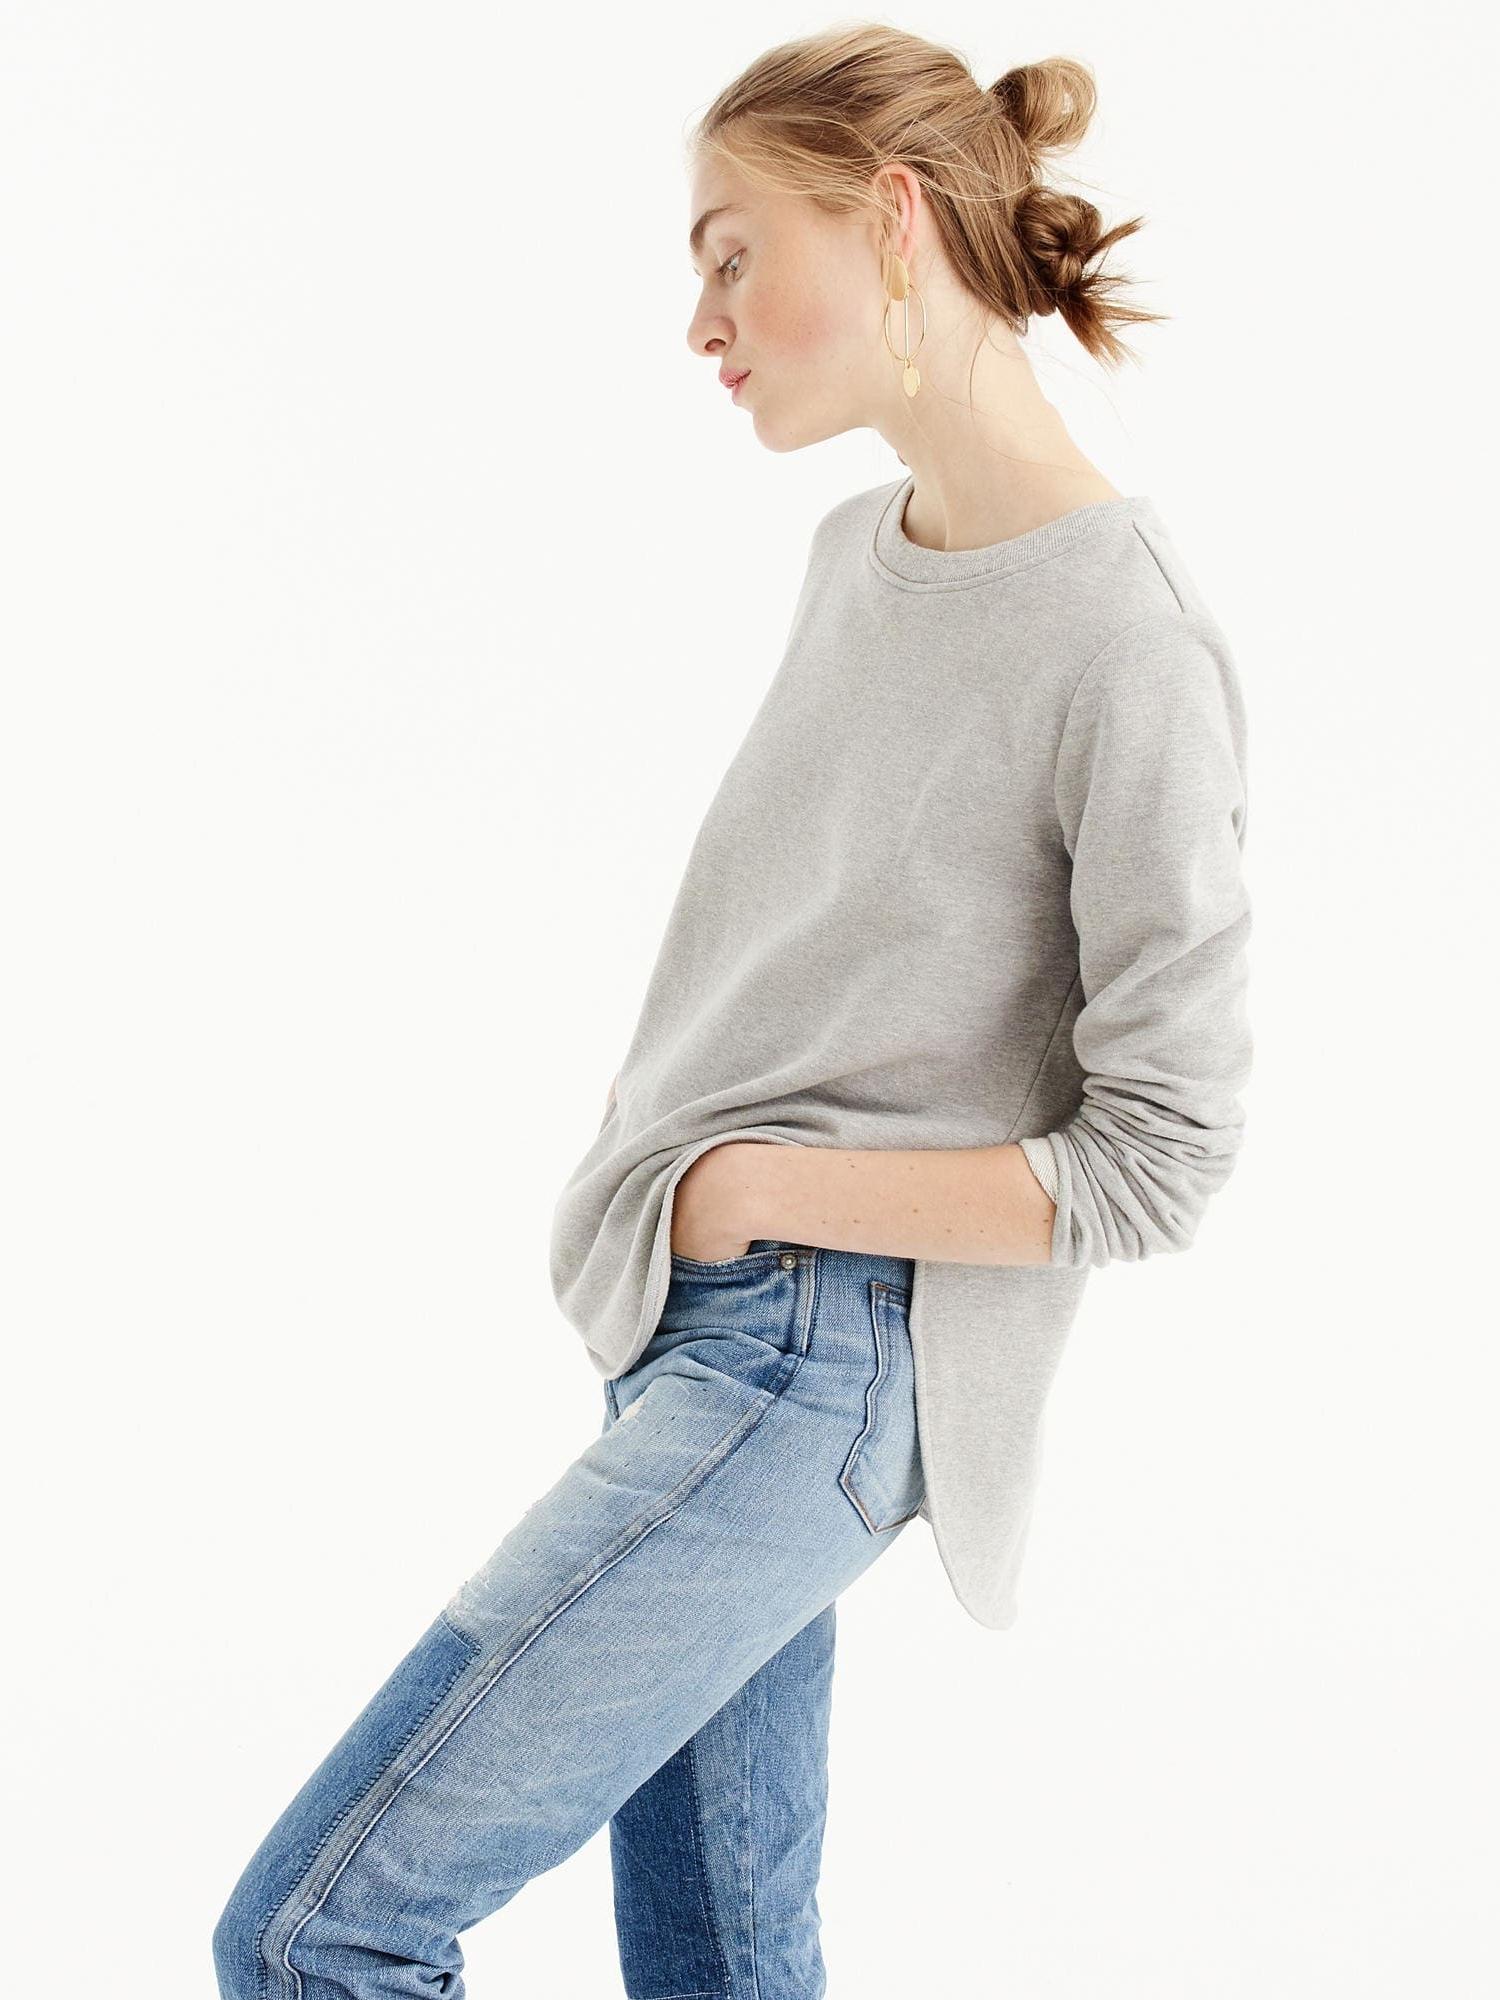 J.CREW Round Hem sweatshirt Tunic  This easy sweatshirt tunic has a rounded hem that's just the right (bum-covering) length.